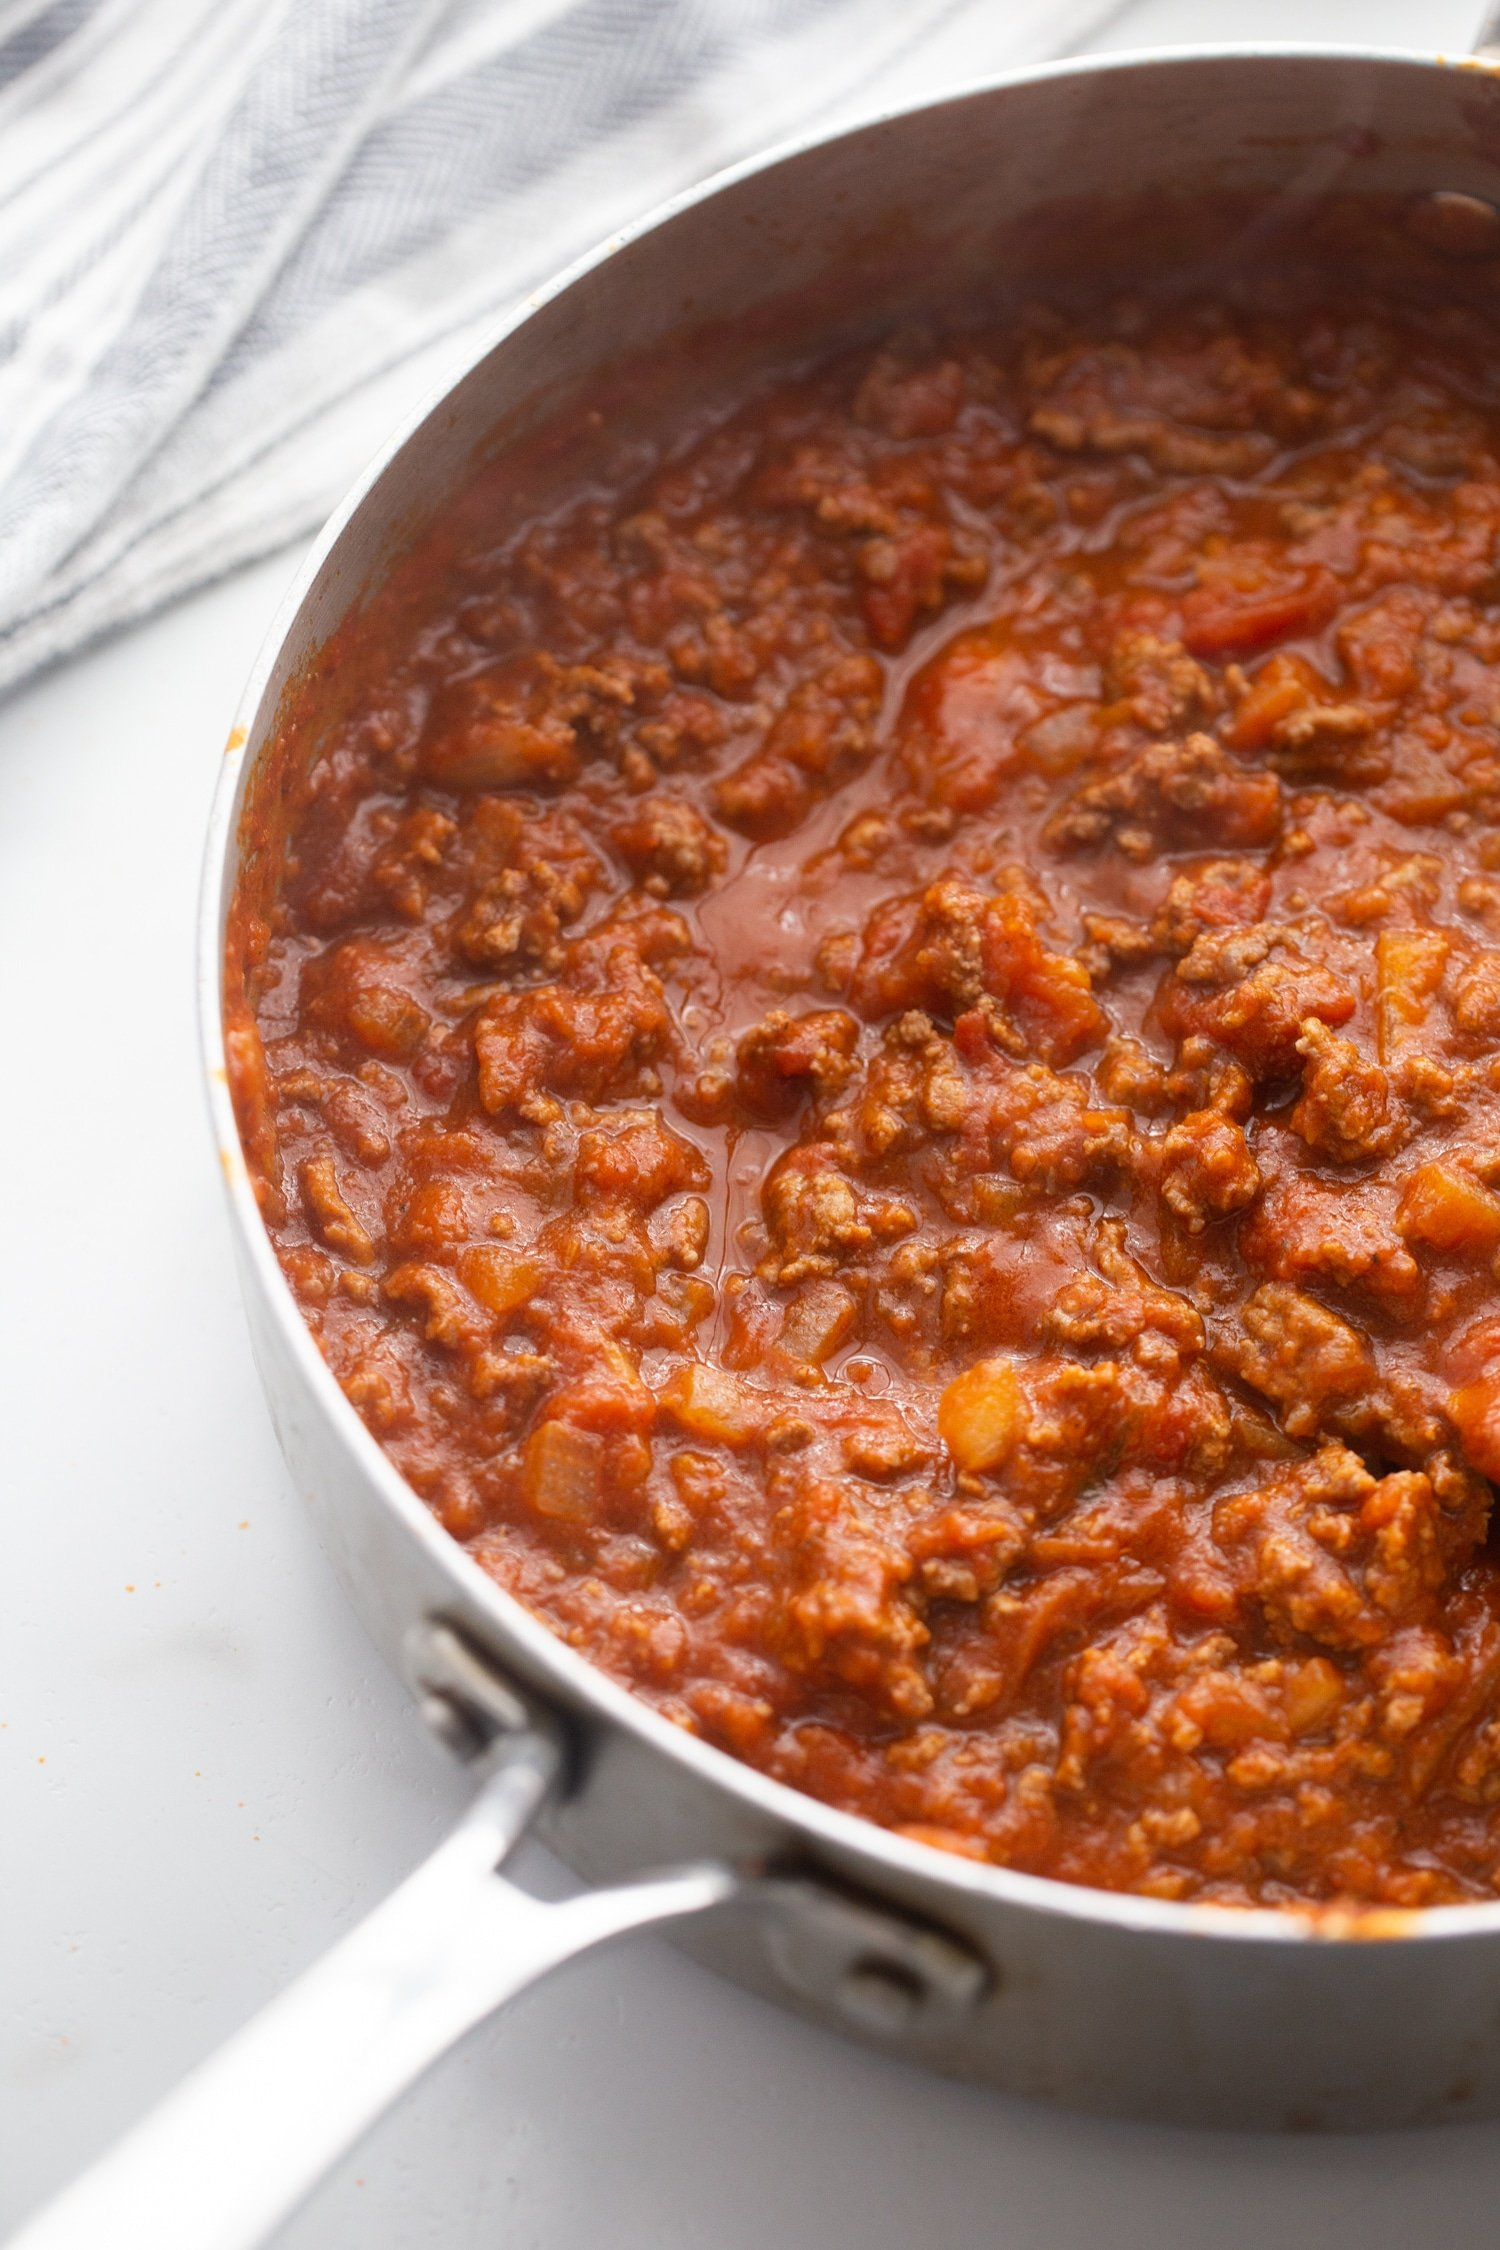 low carb spaghetti sauce in skillet for keto spaghetti casserole